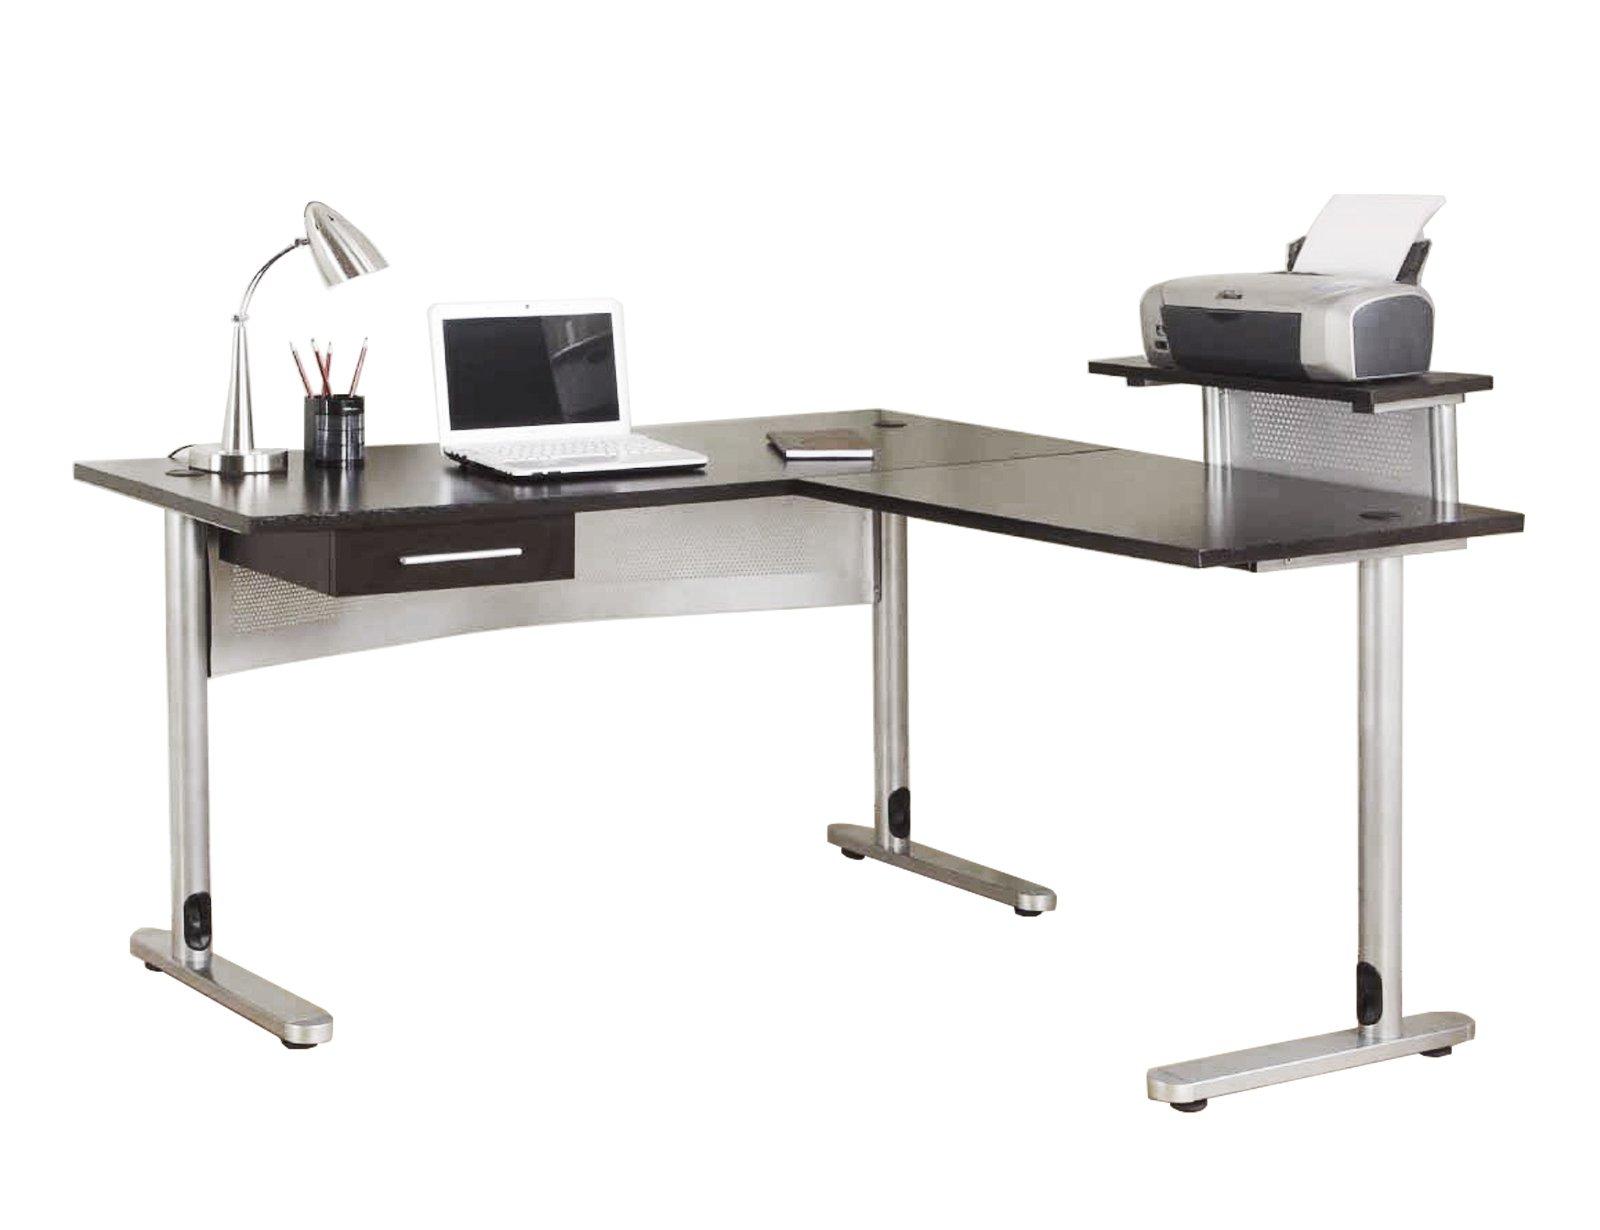 FIVEGIVEN L Shaped Office Desk Corner Desk for Home Office with Drawer and Shelf, MDF Wood and Metal, Black